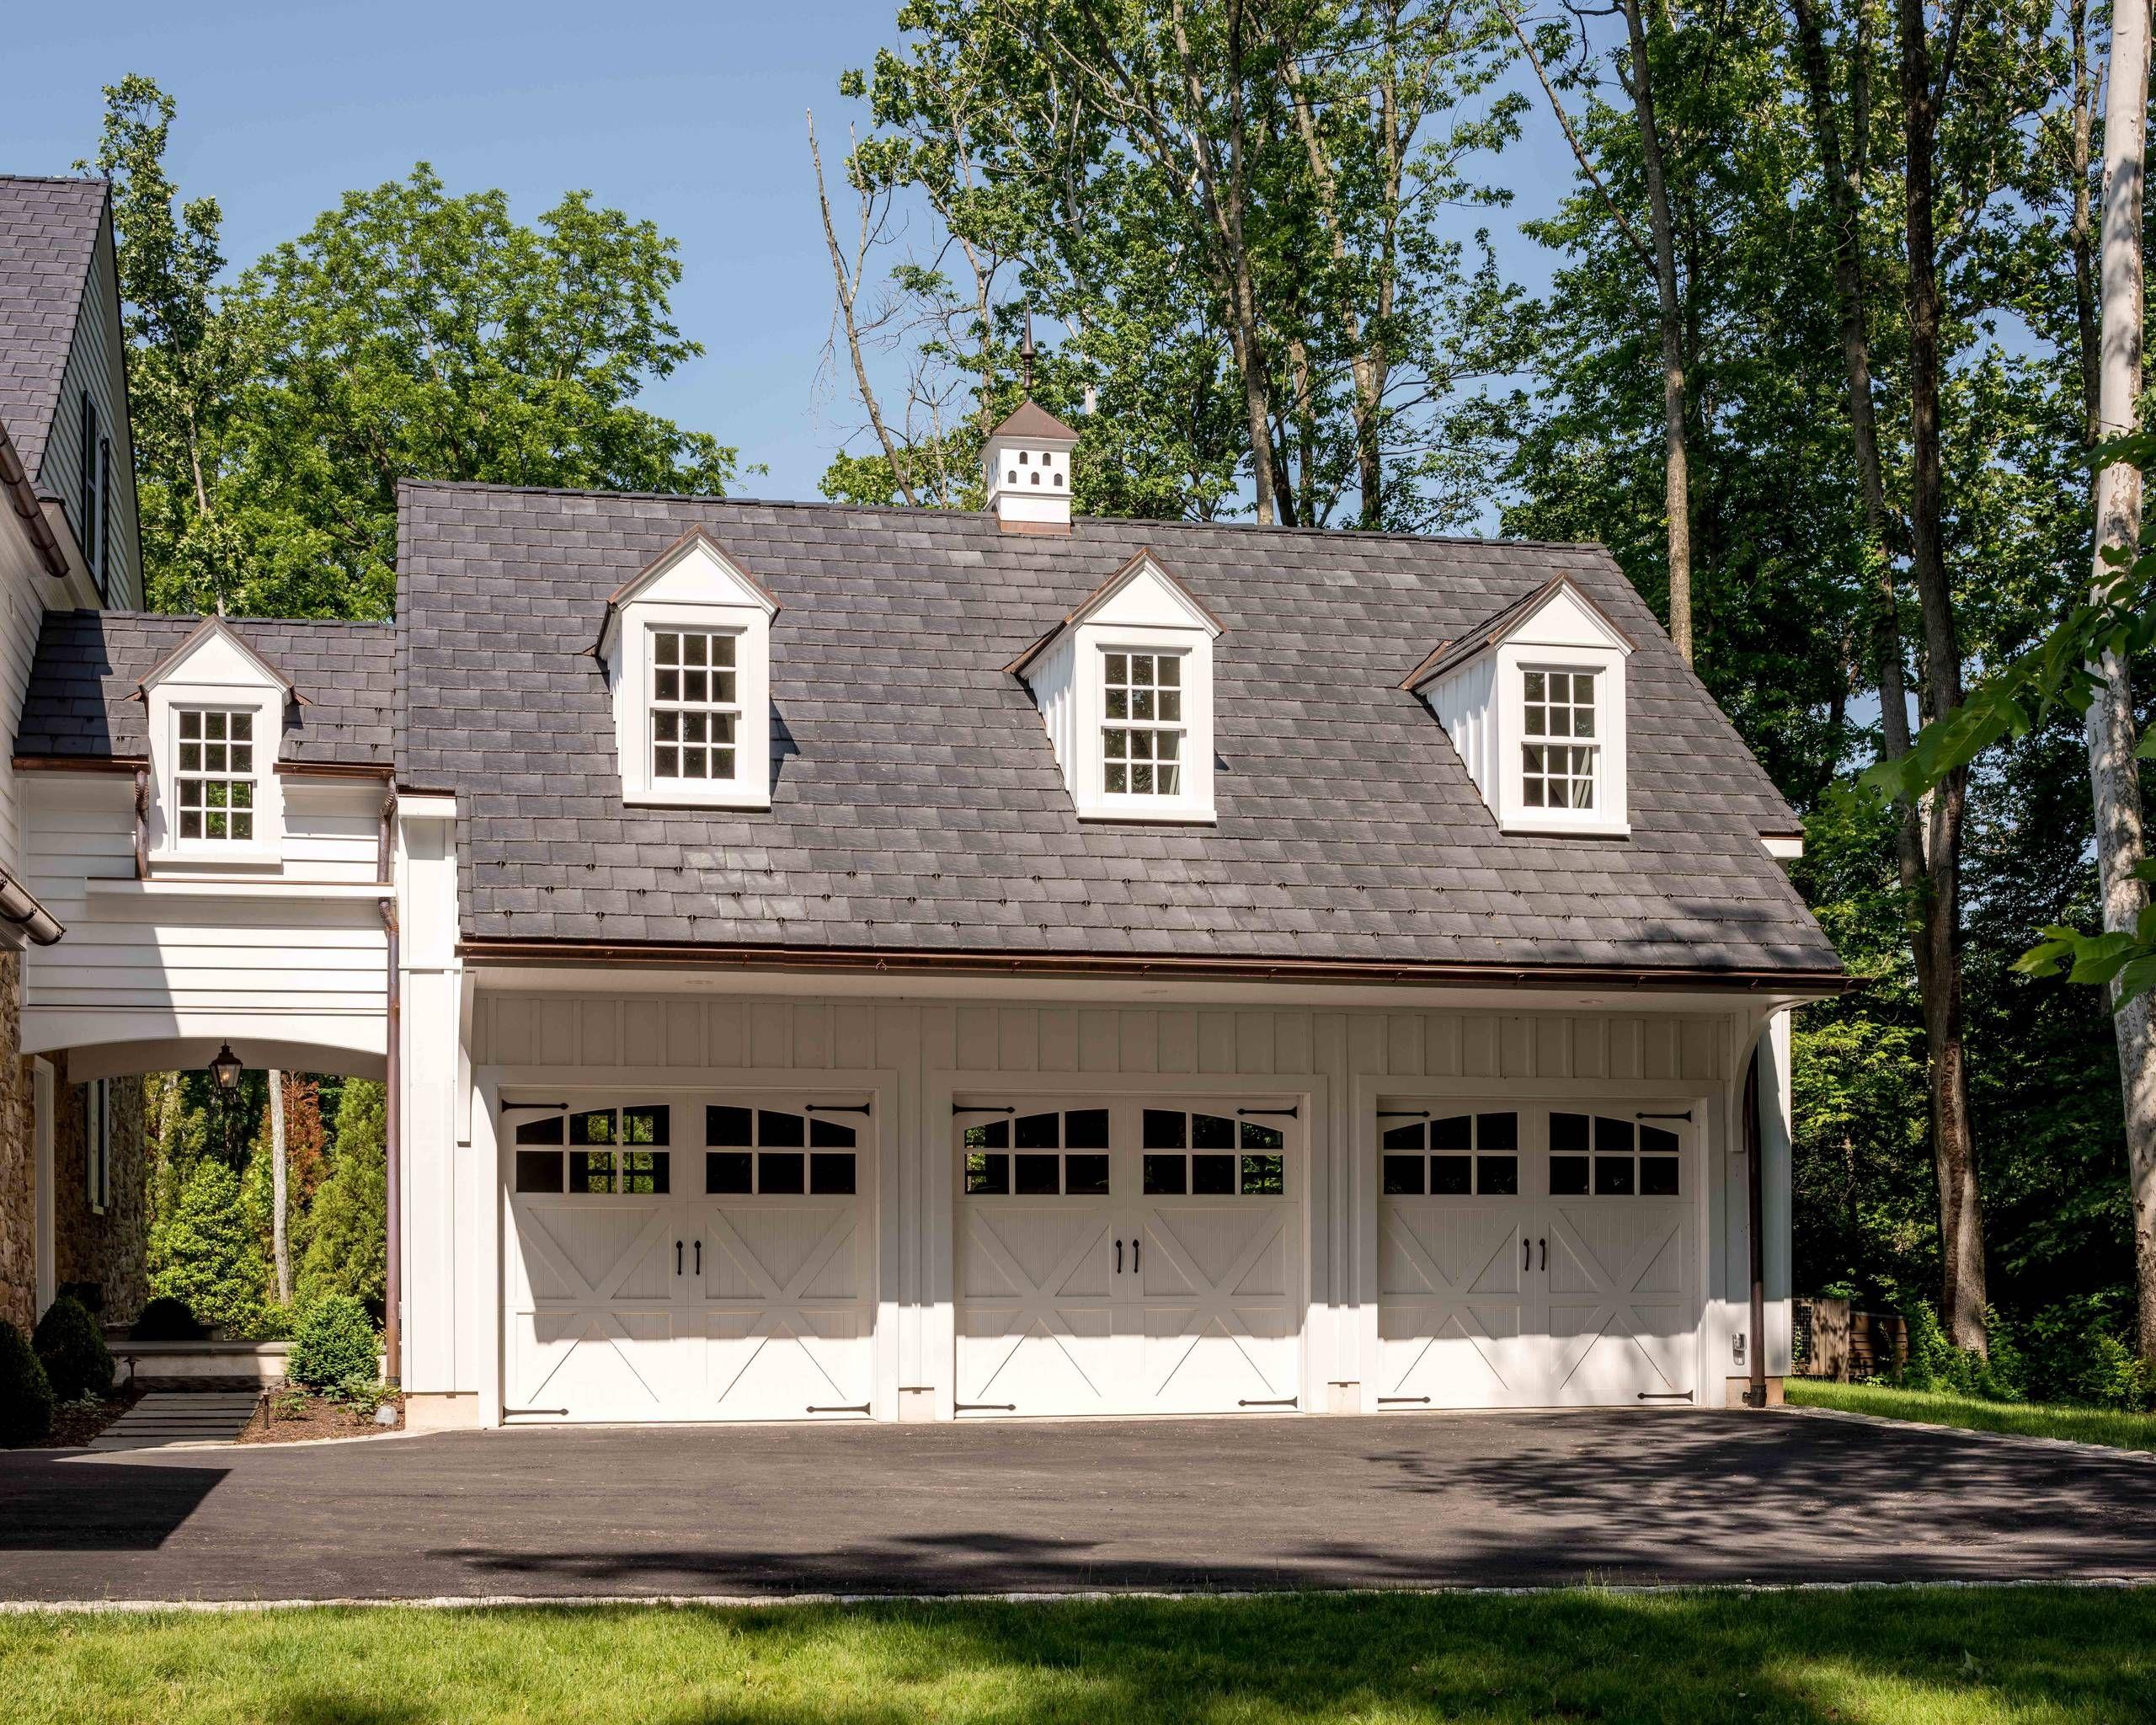 31 Garage Styles Home Awakening Detached Garage Designs Carriage House Plans Garage Exterior